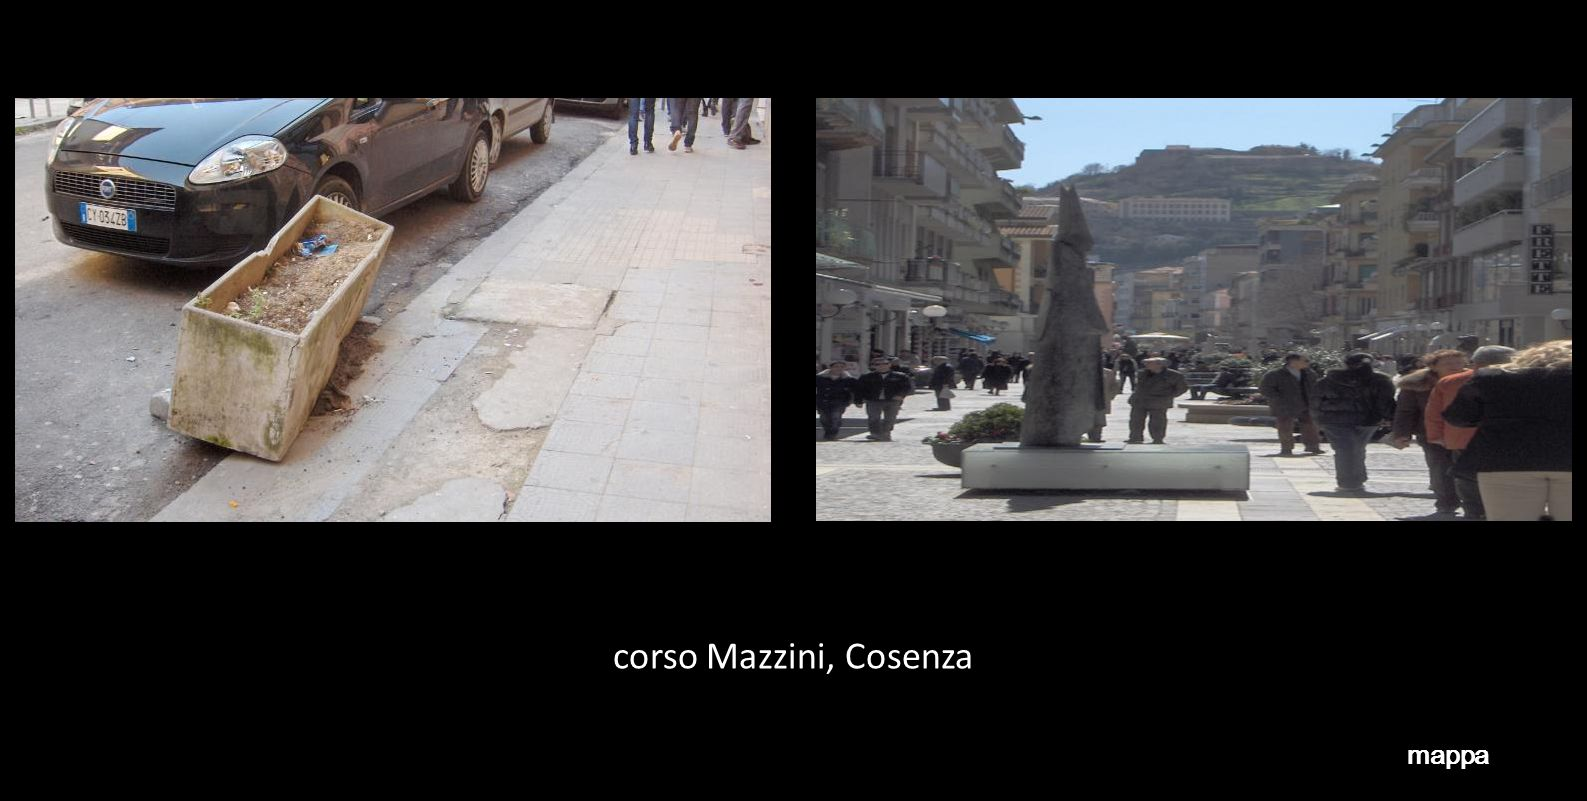 via Popilia, Cosenza mappa